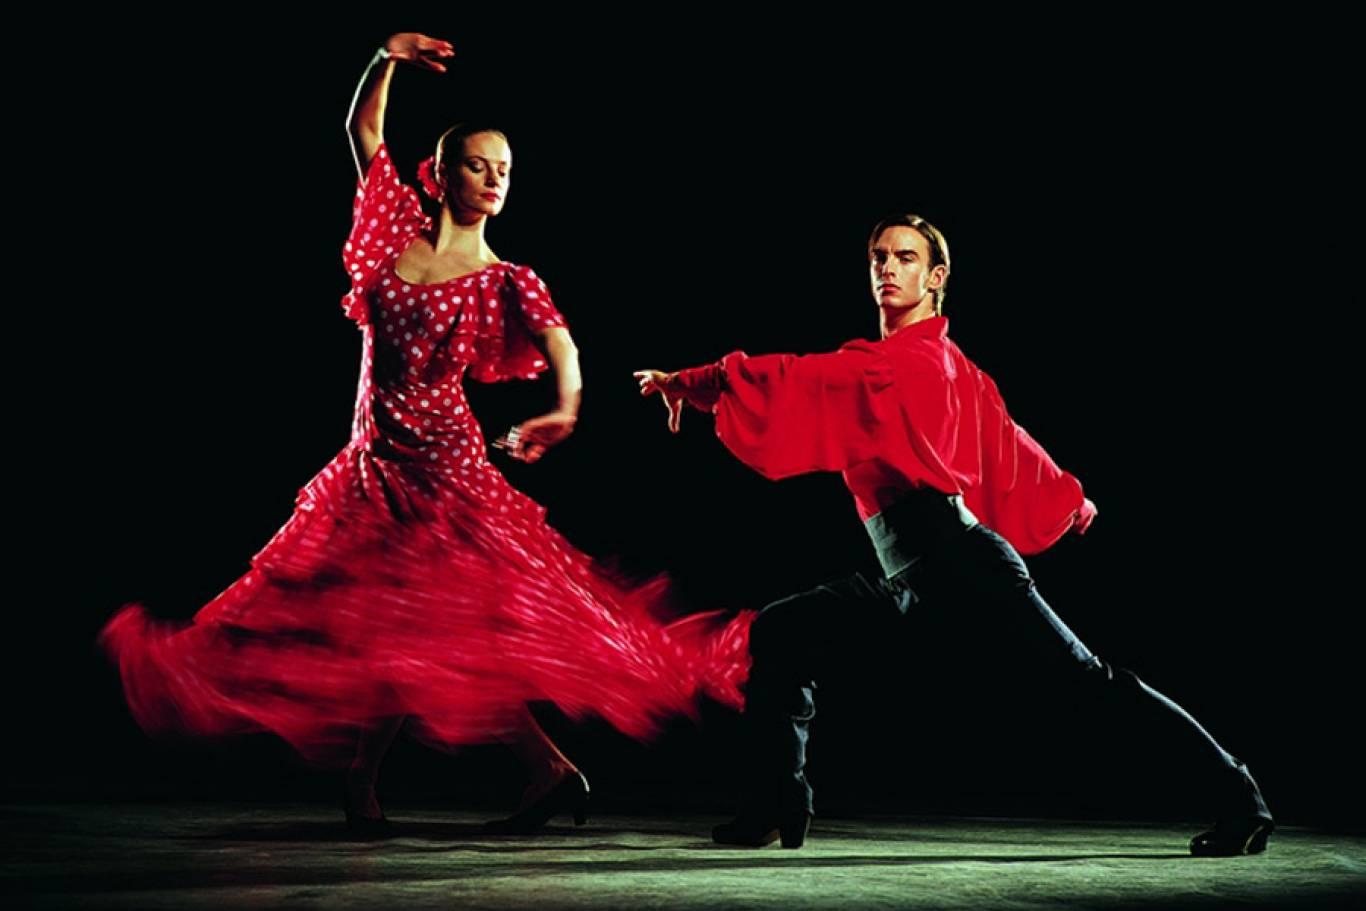 Фламенко — история и характеристика танца фламенко — фото 2